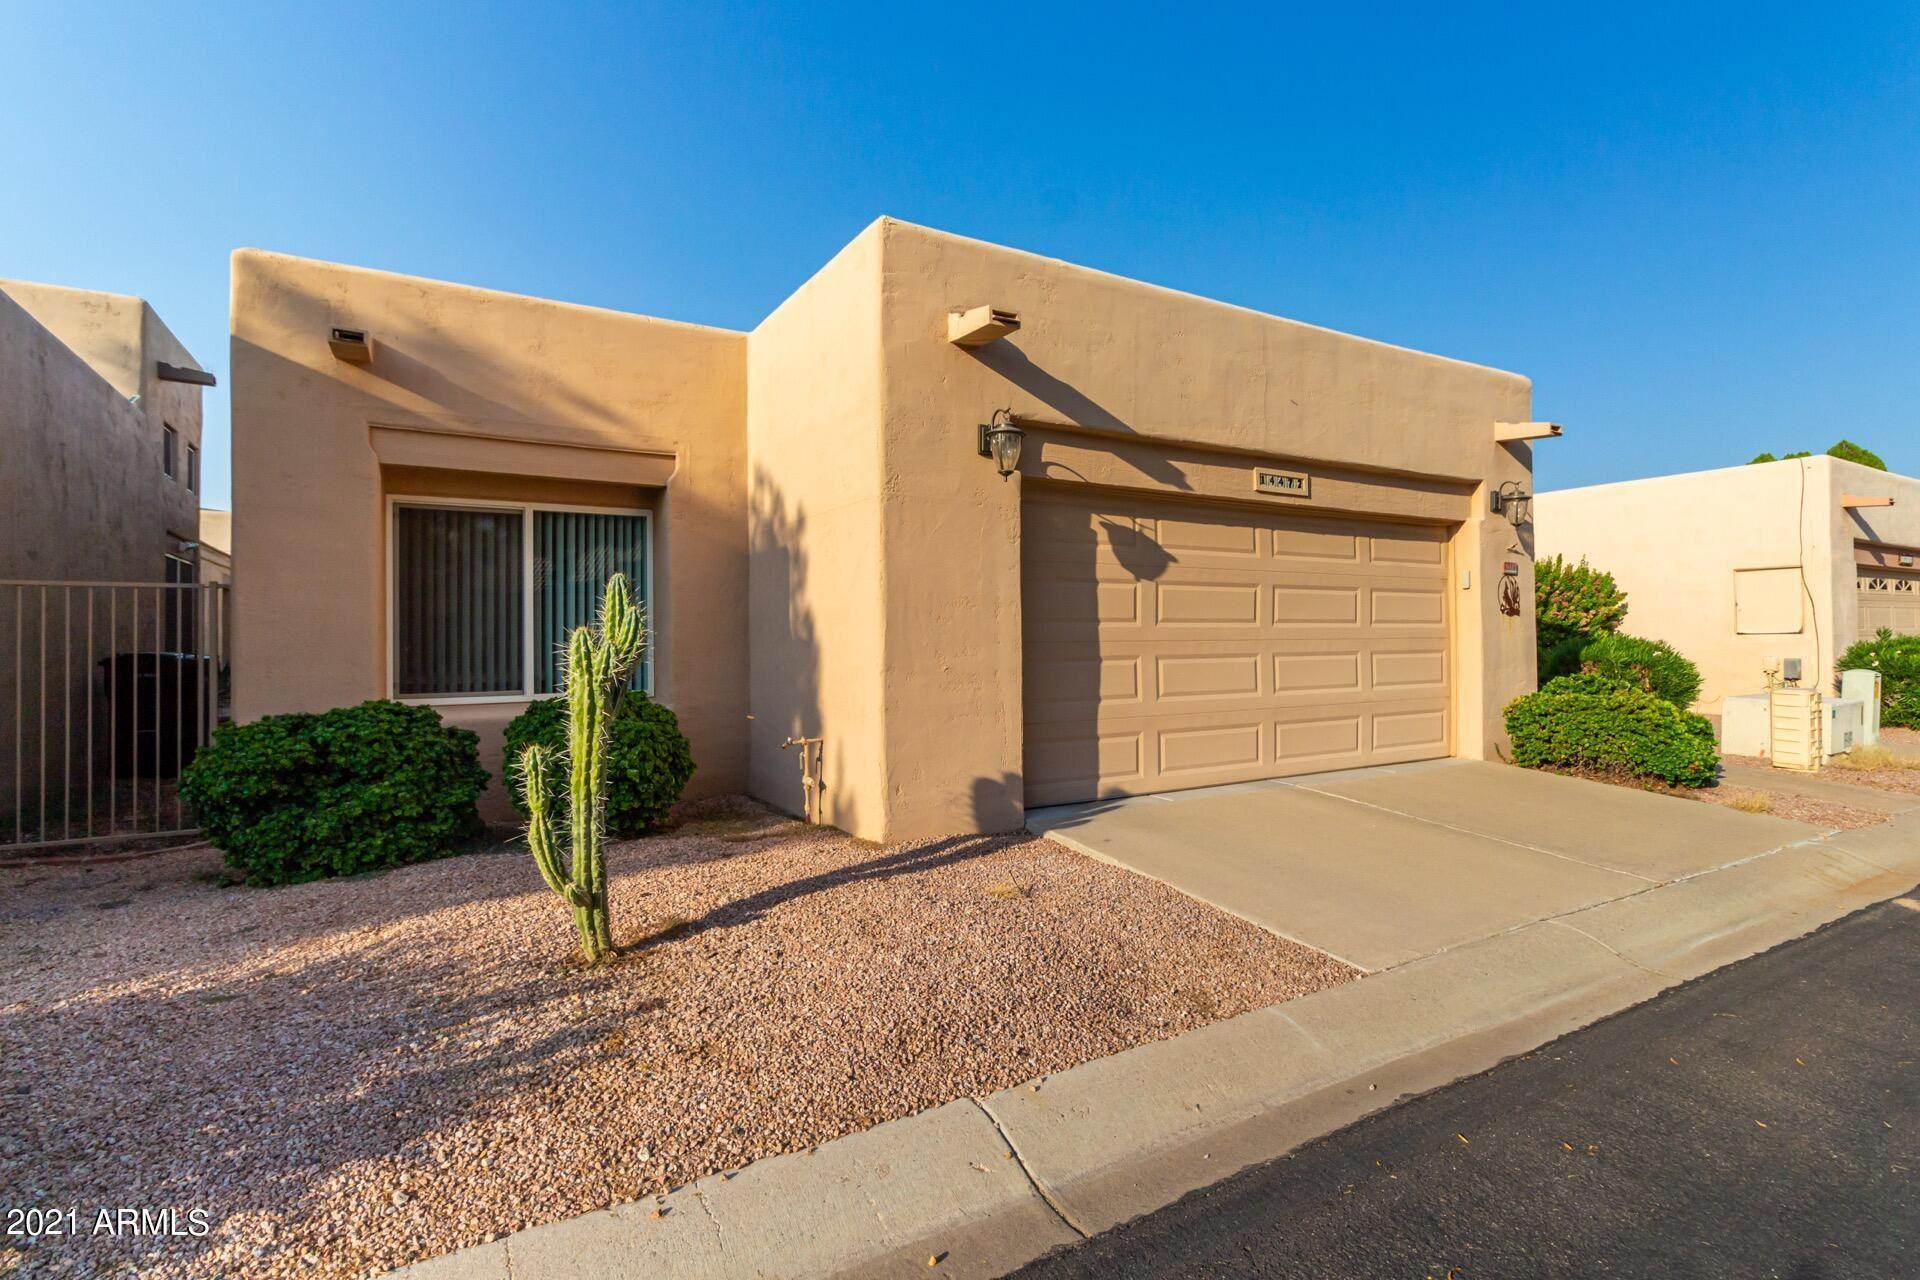 14472 W MOCCASIN Trail, Surprise, AZ 85374 - MLS#: 6293924